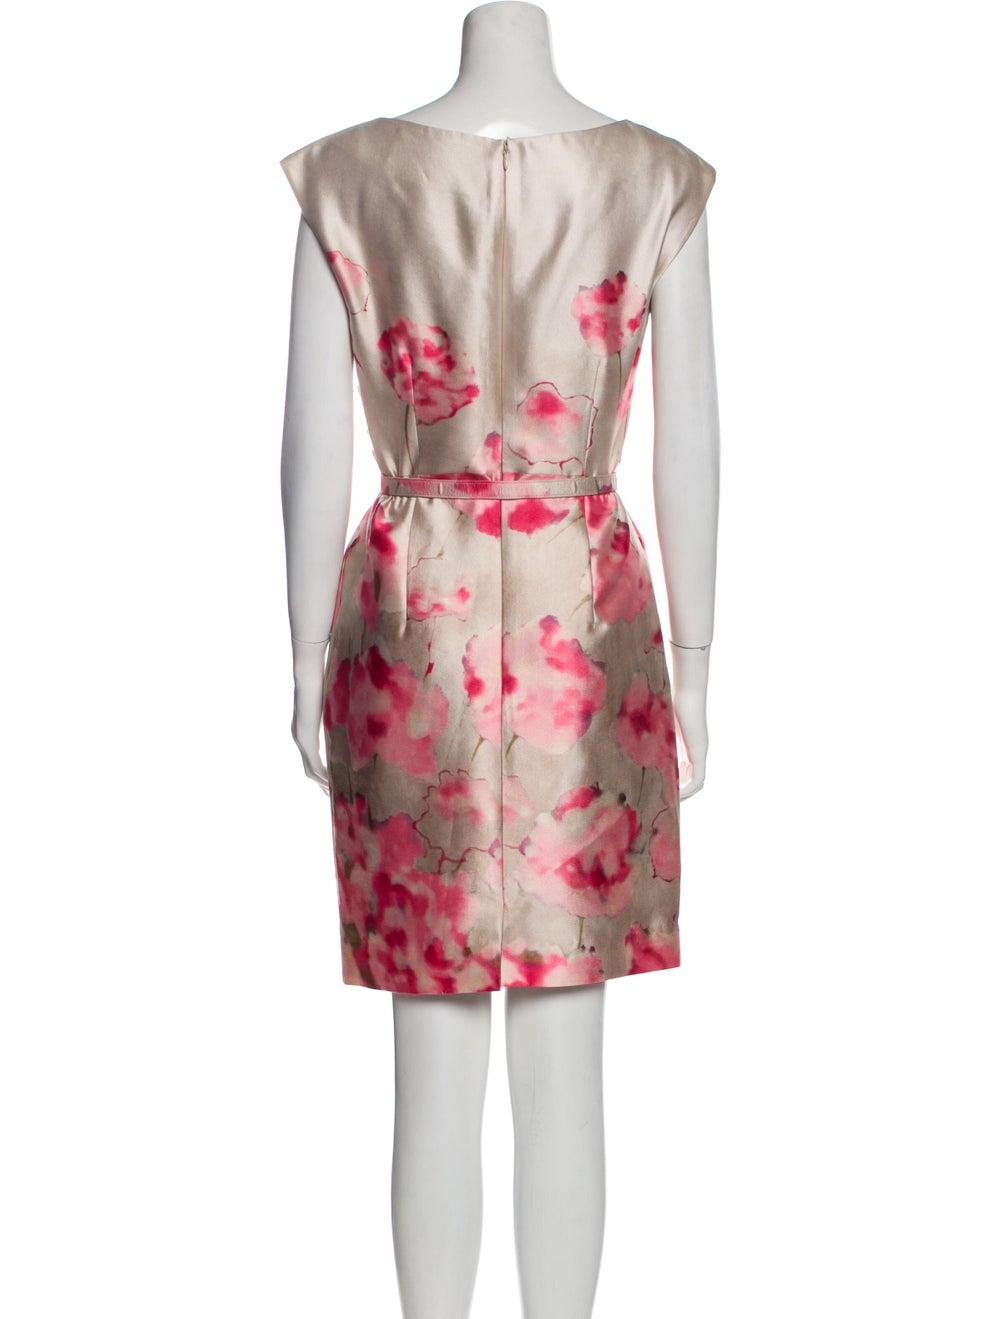 Valentino Silk Knee-Length Dress - image 3